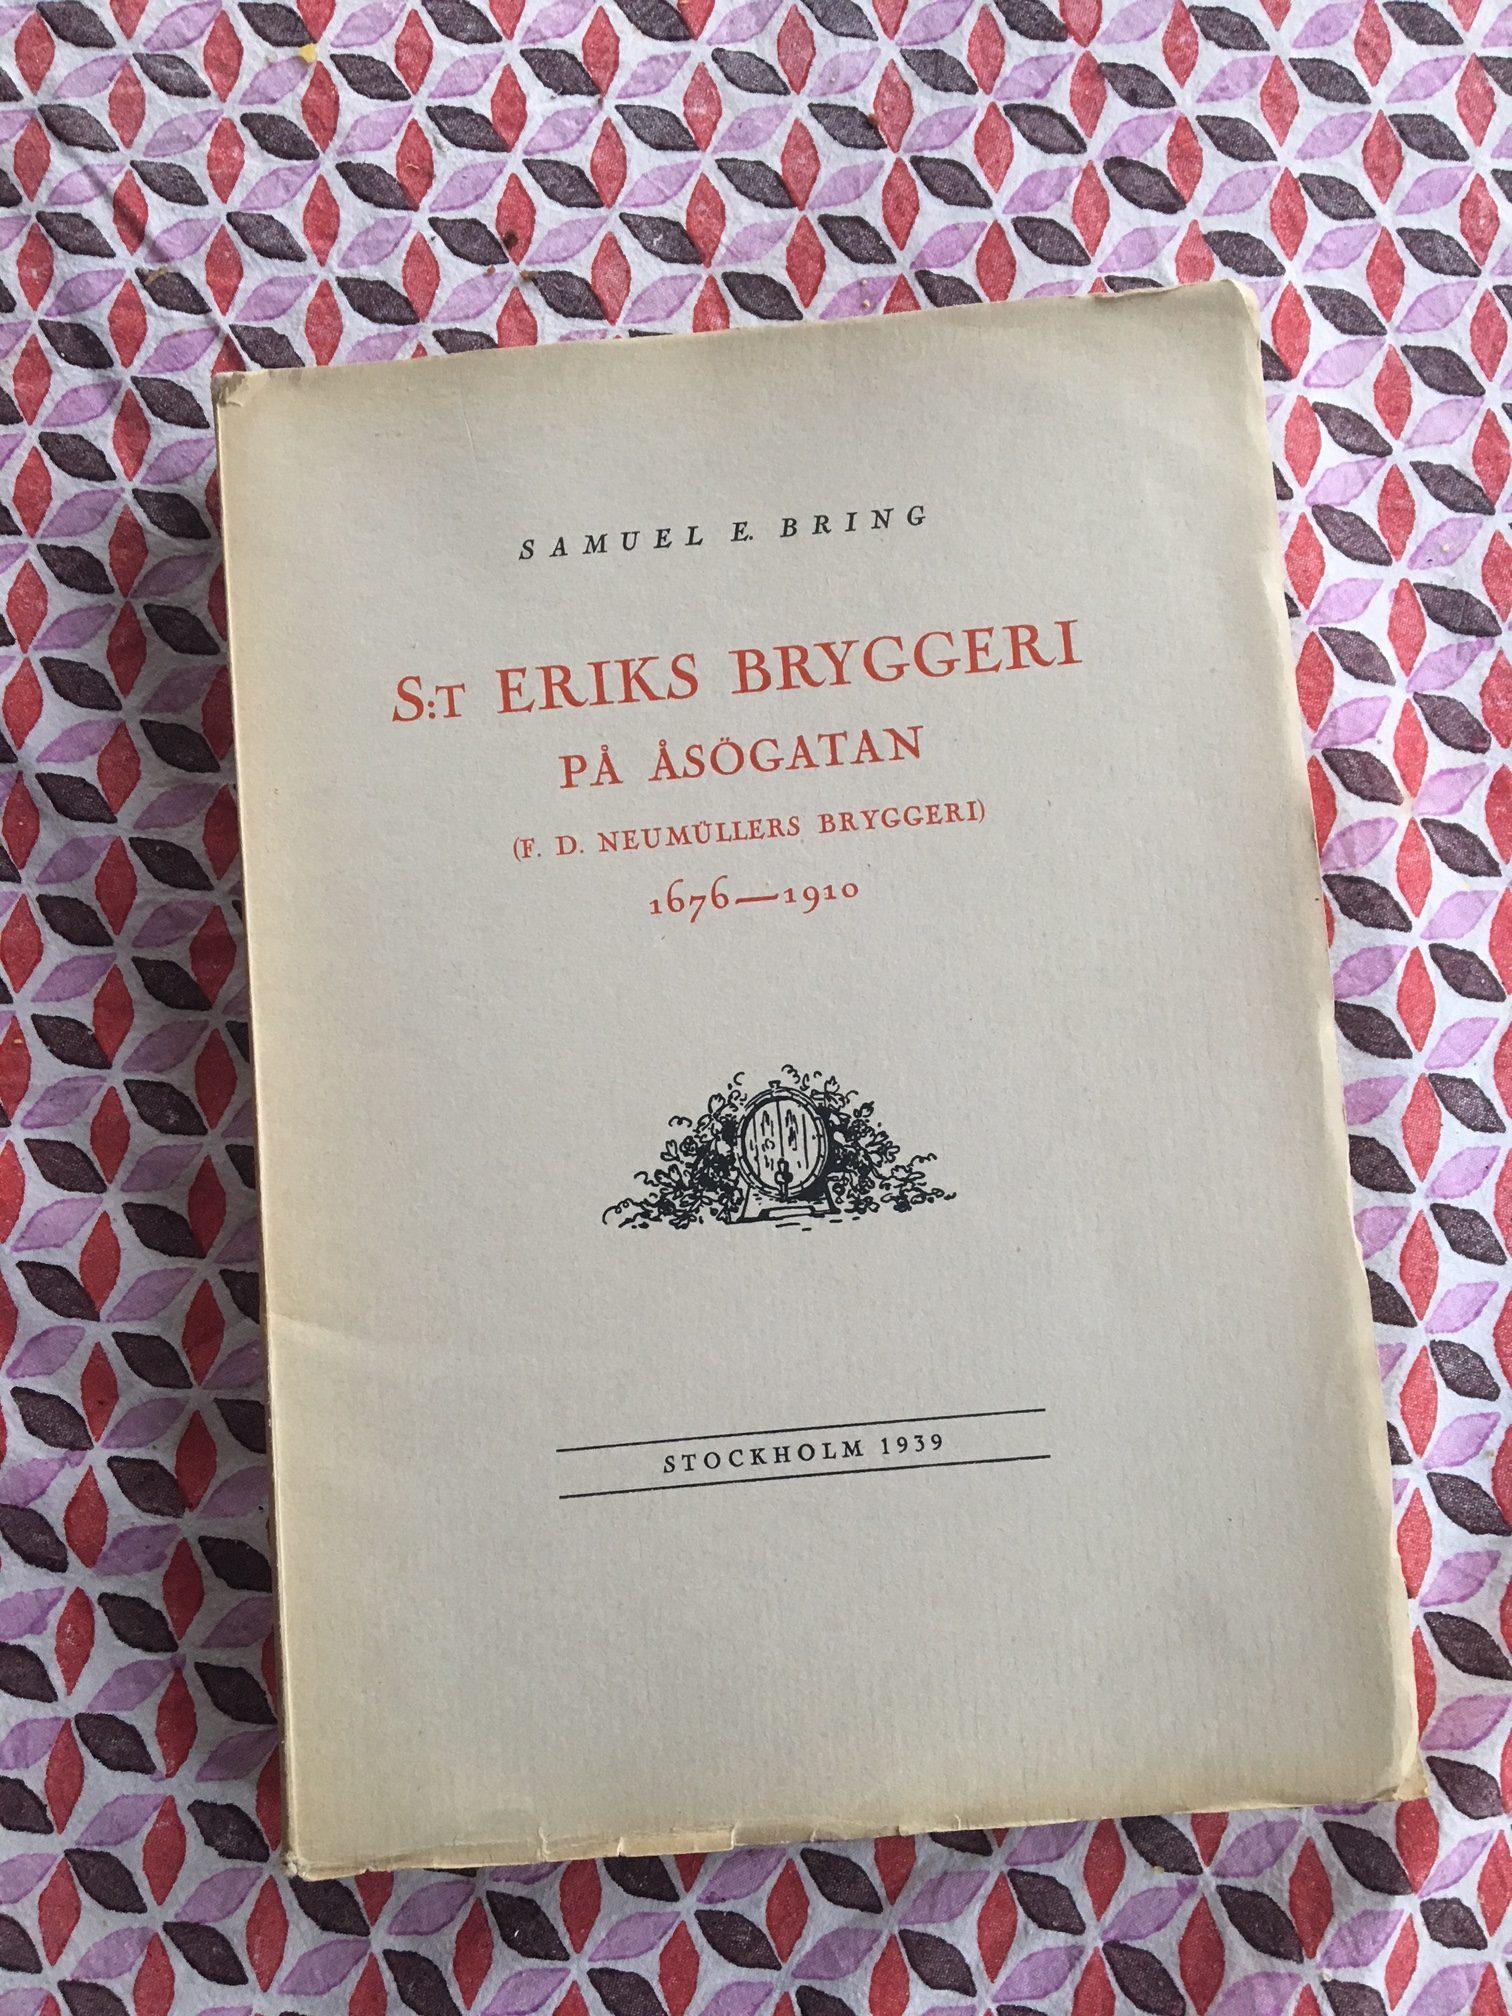 St Eriks bryggeri - historisk bok. Foto: Joel Linderoth.